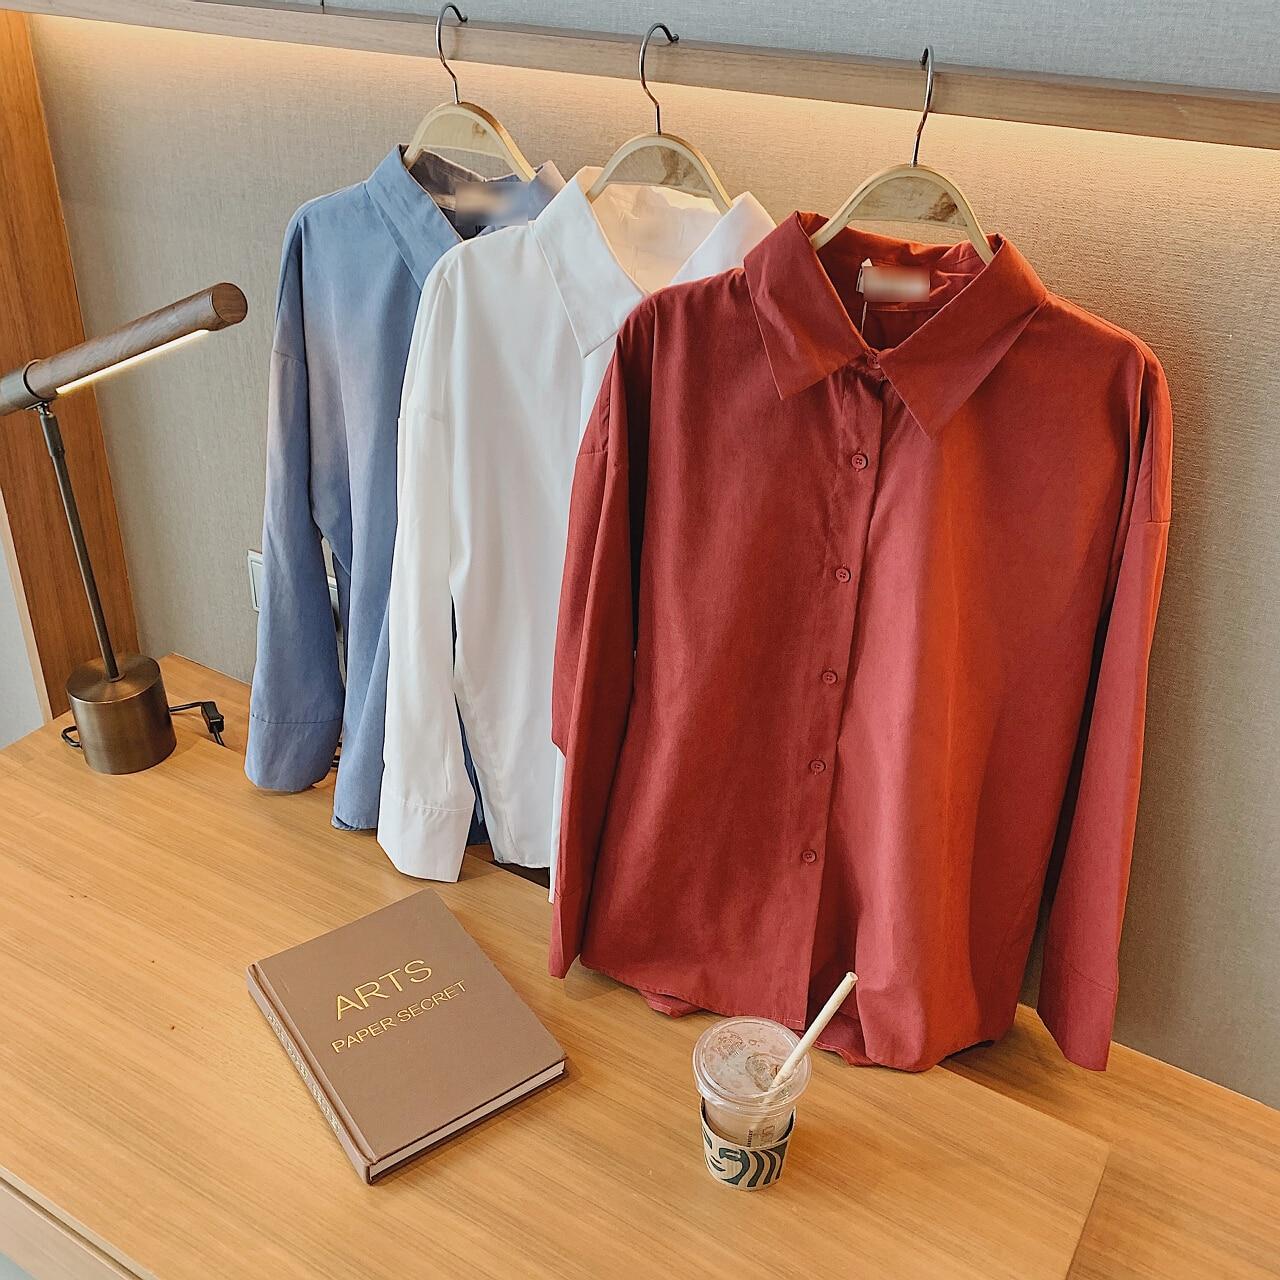 2021 Women's Shirt And Blouses Clothing Woman Tops Za Oversize New Tunics Fashion Red Spring Long Sleeve Elegant Korean Jacket